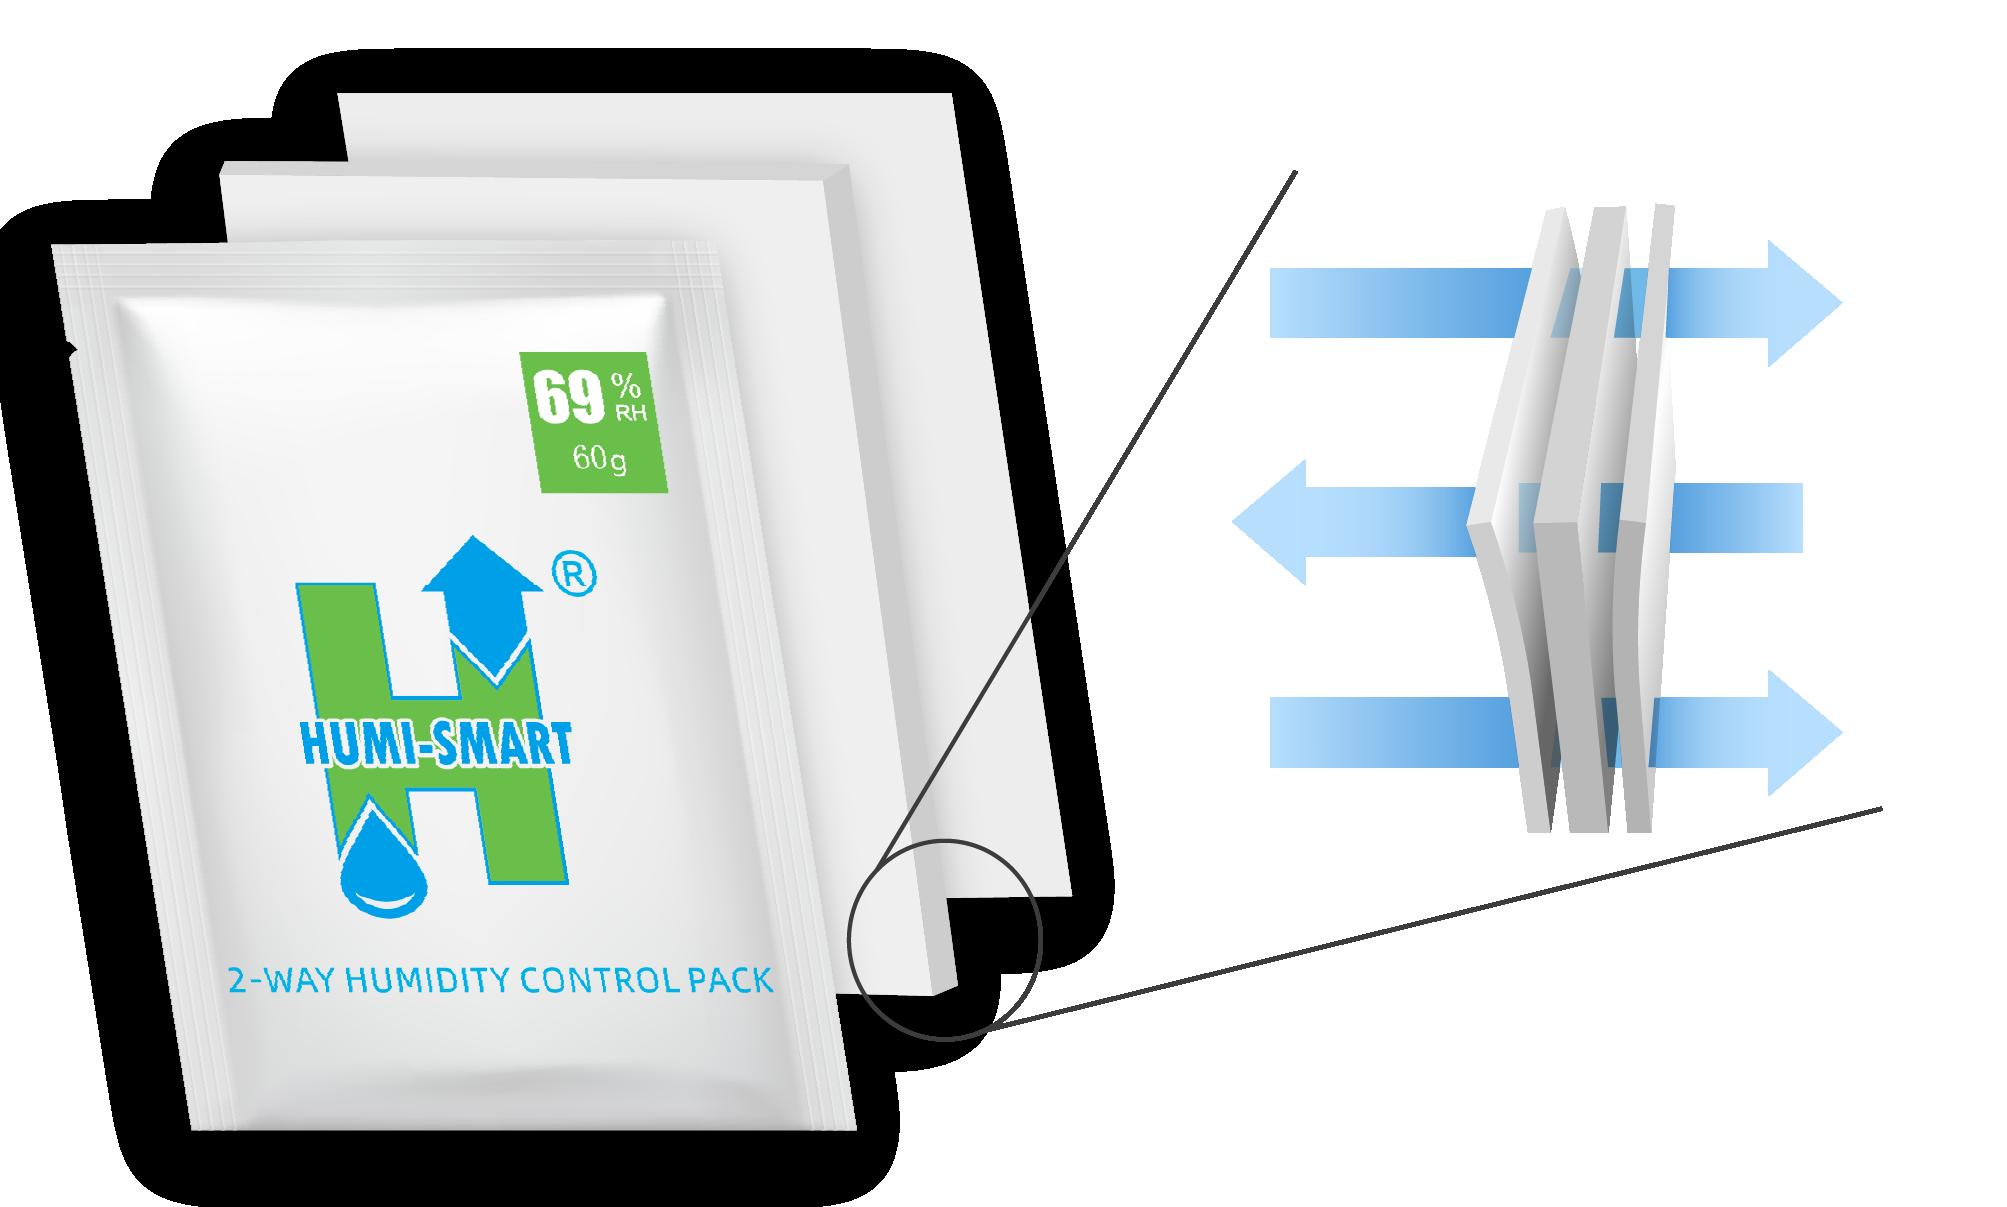 Humi-Smart 2-Way Control 69/% RH 4g 20-Pack